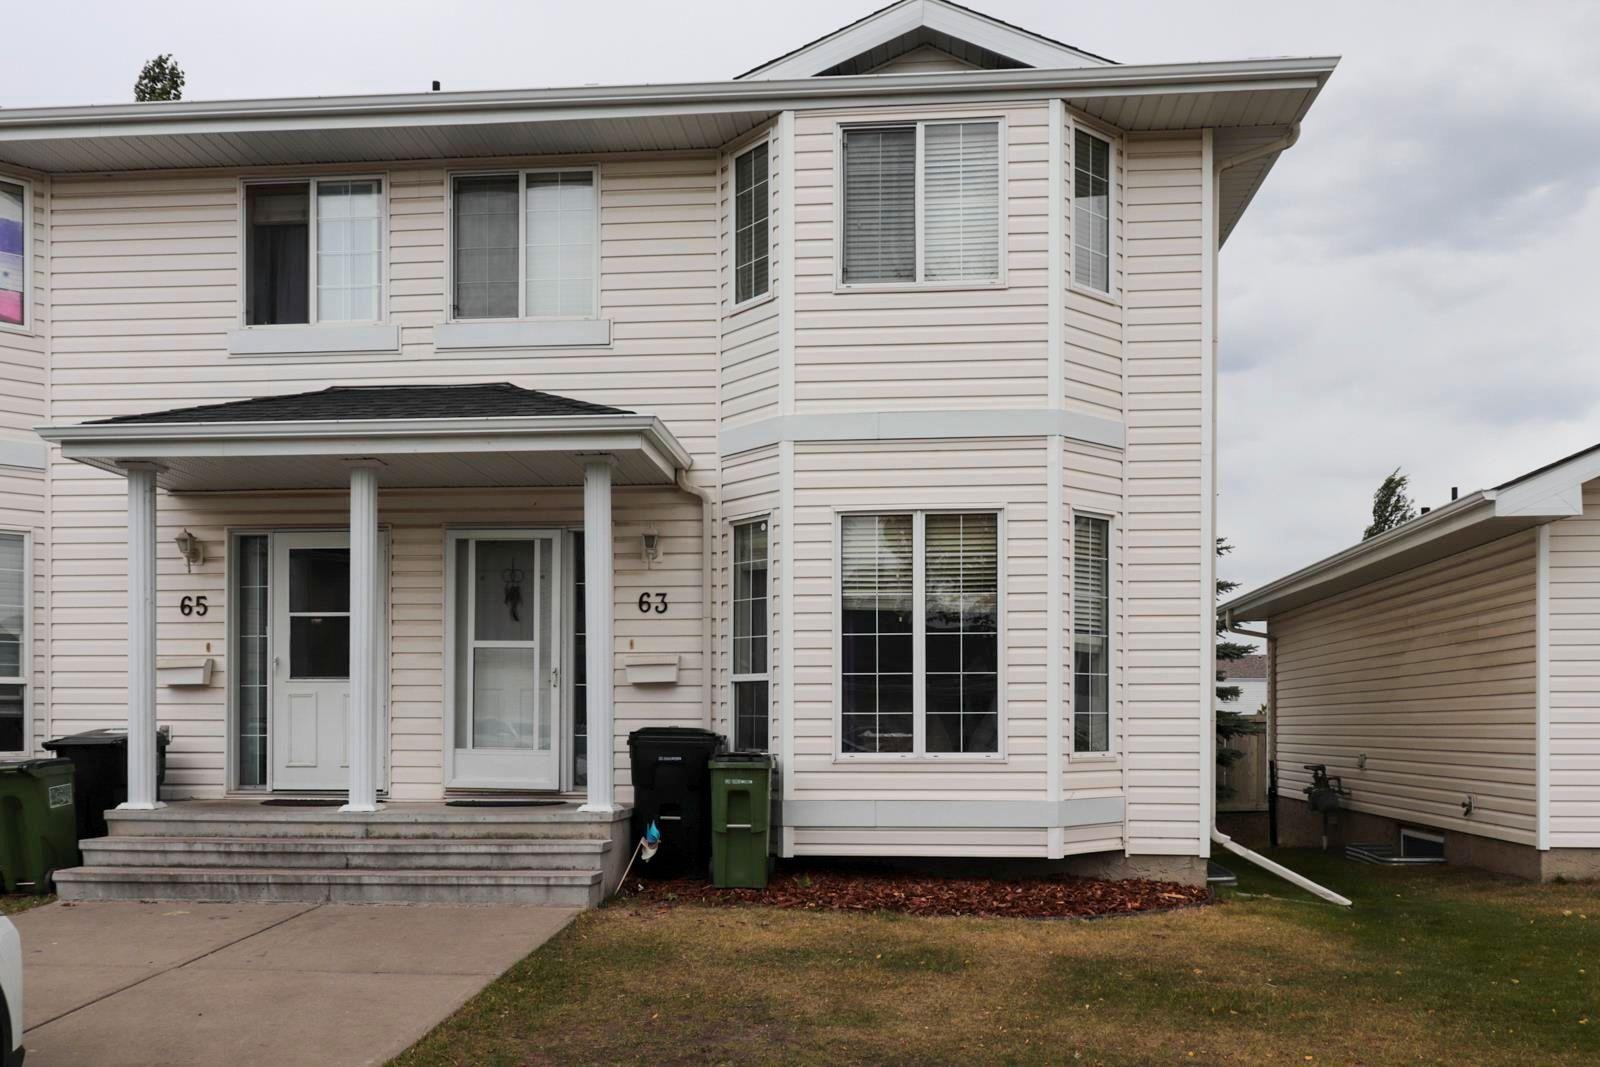 Main Photo: 63 3380 28A Avenue in Edmonton: Zone 30 Townhouse for sale : MLS®# E4262279